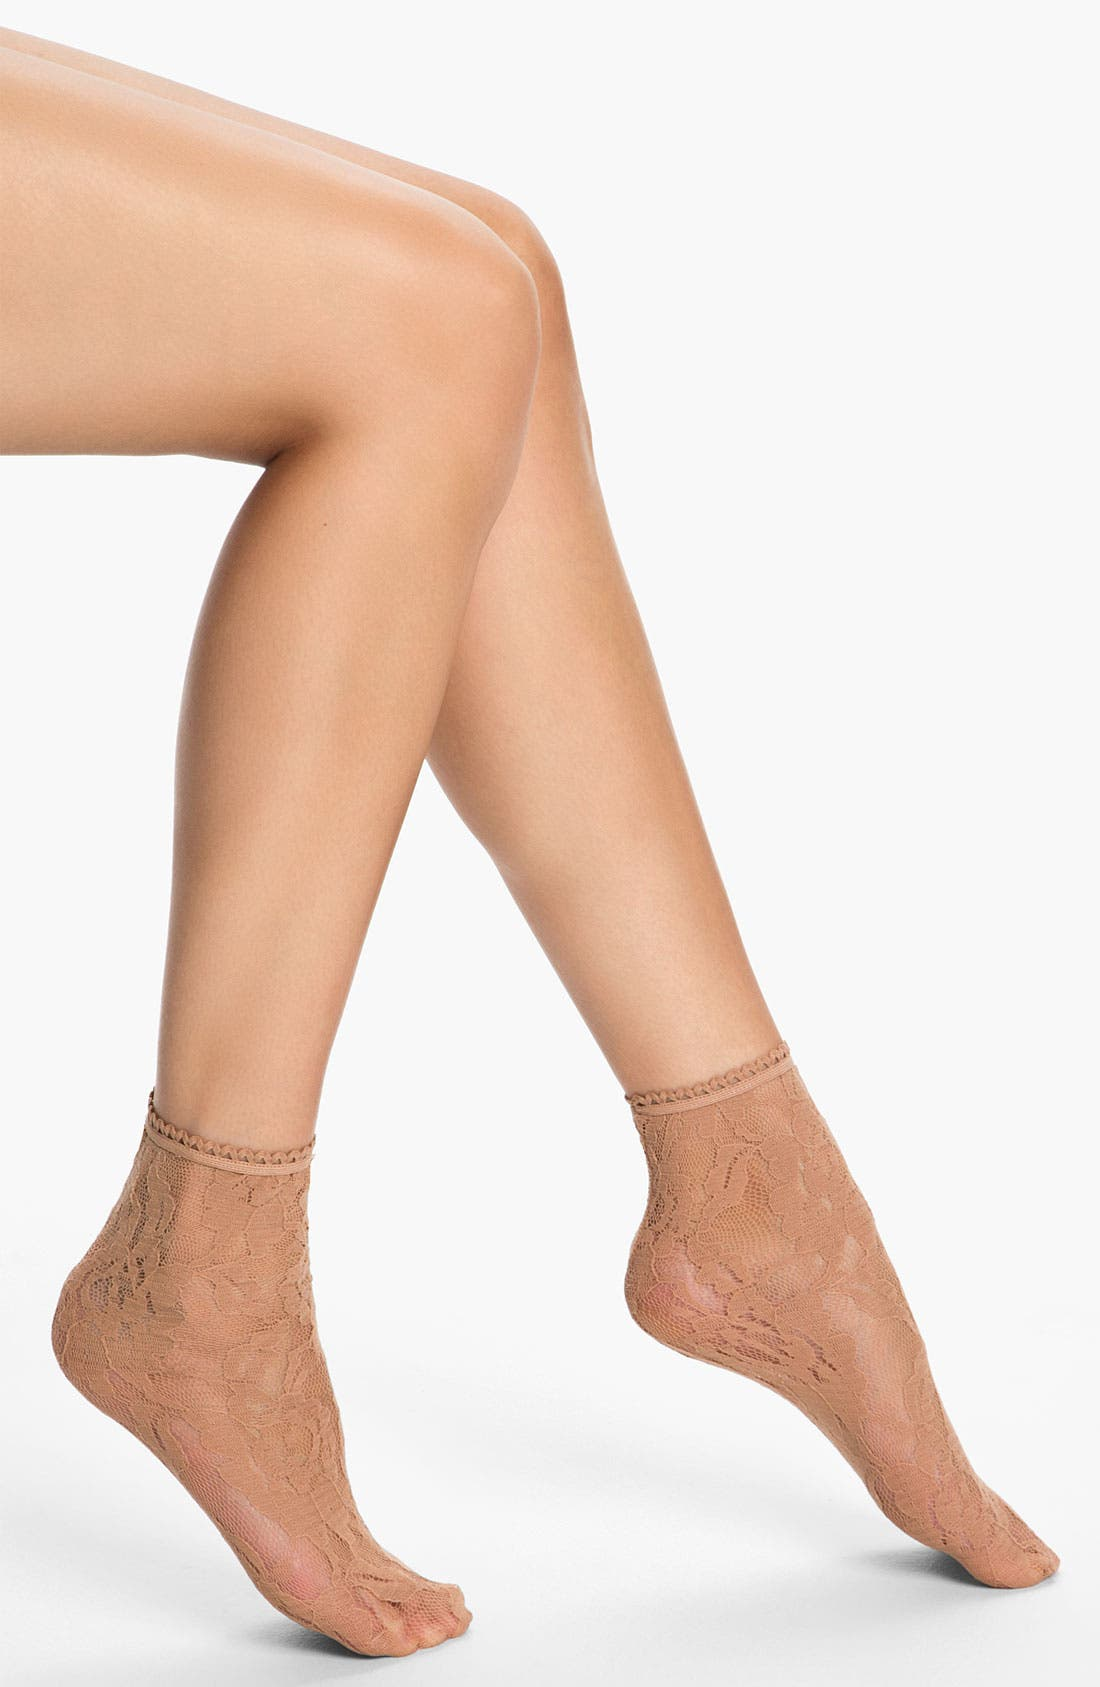 Alternate Image 1 Selected - Nordstrom Lace Anklet